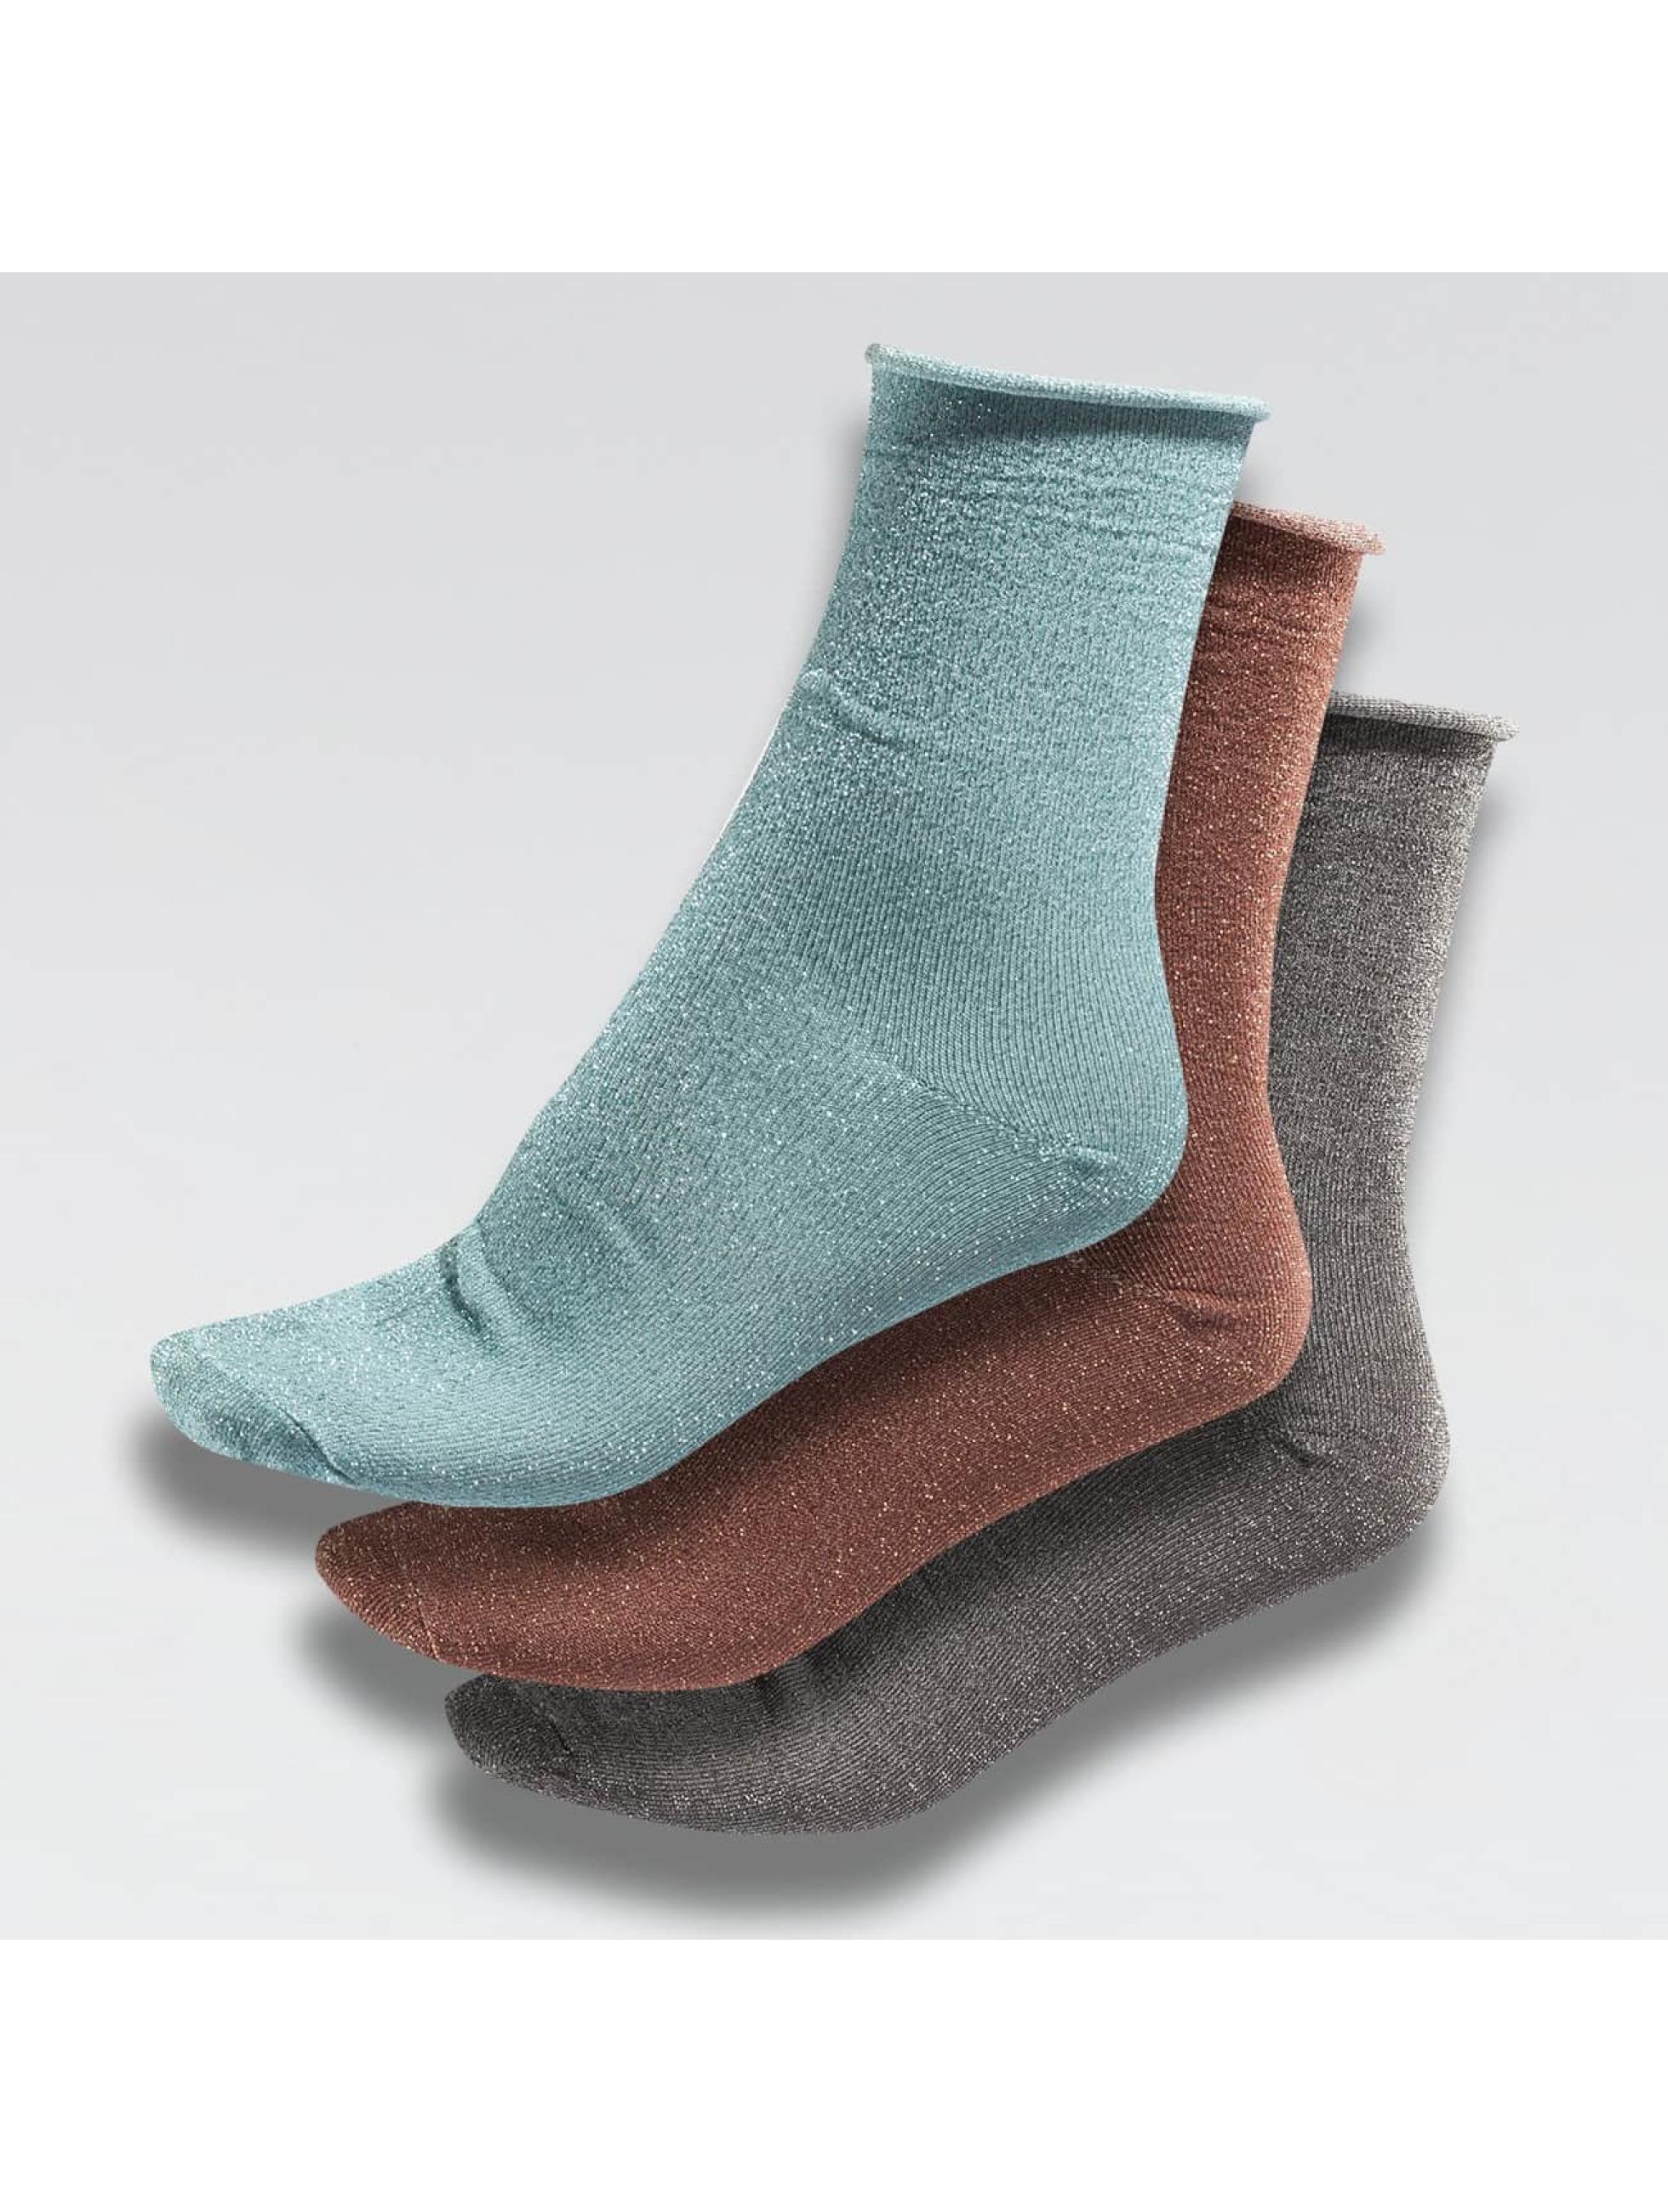 Nümph Frauen Socken Beachplum Glitter in bunt